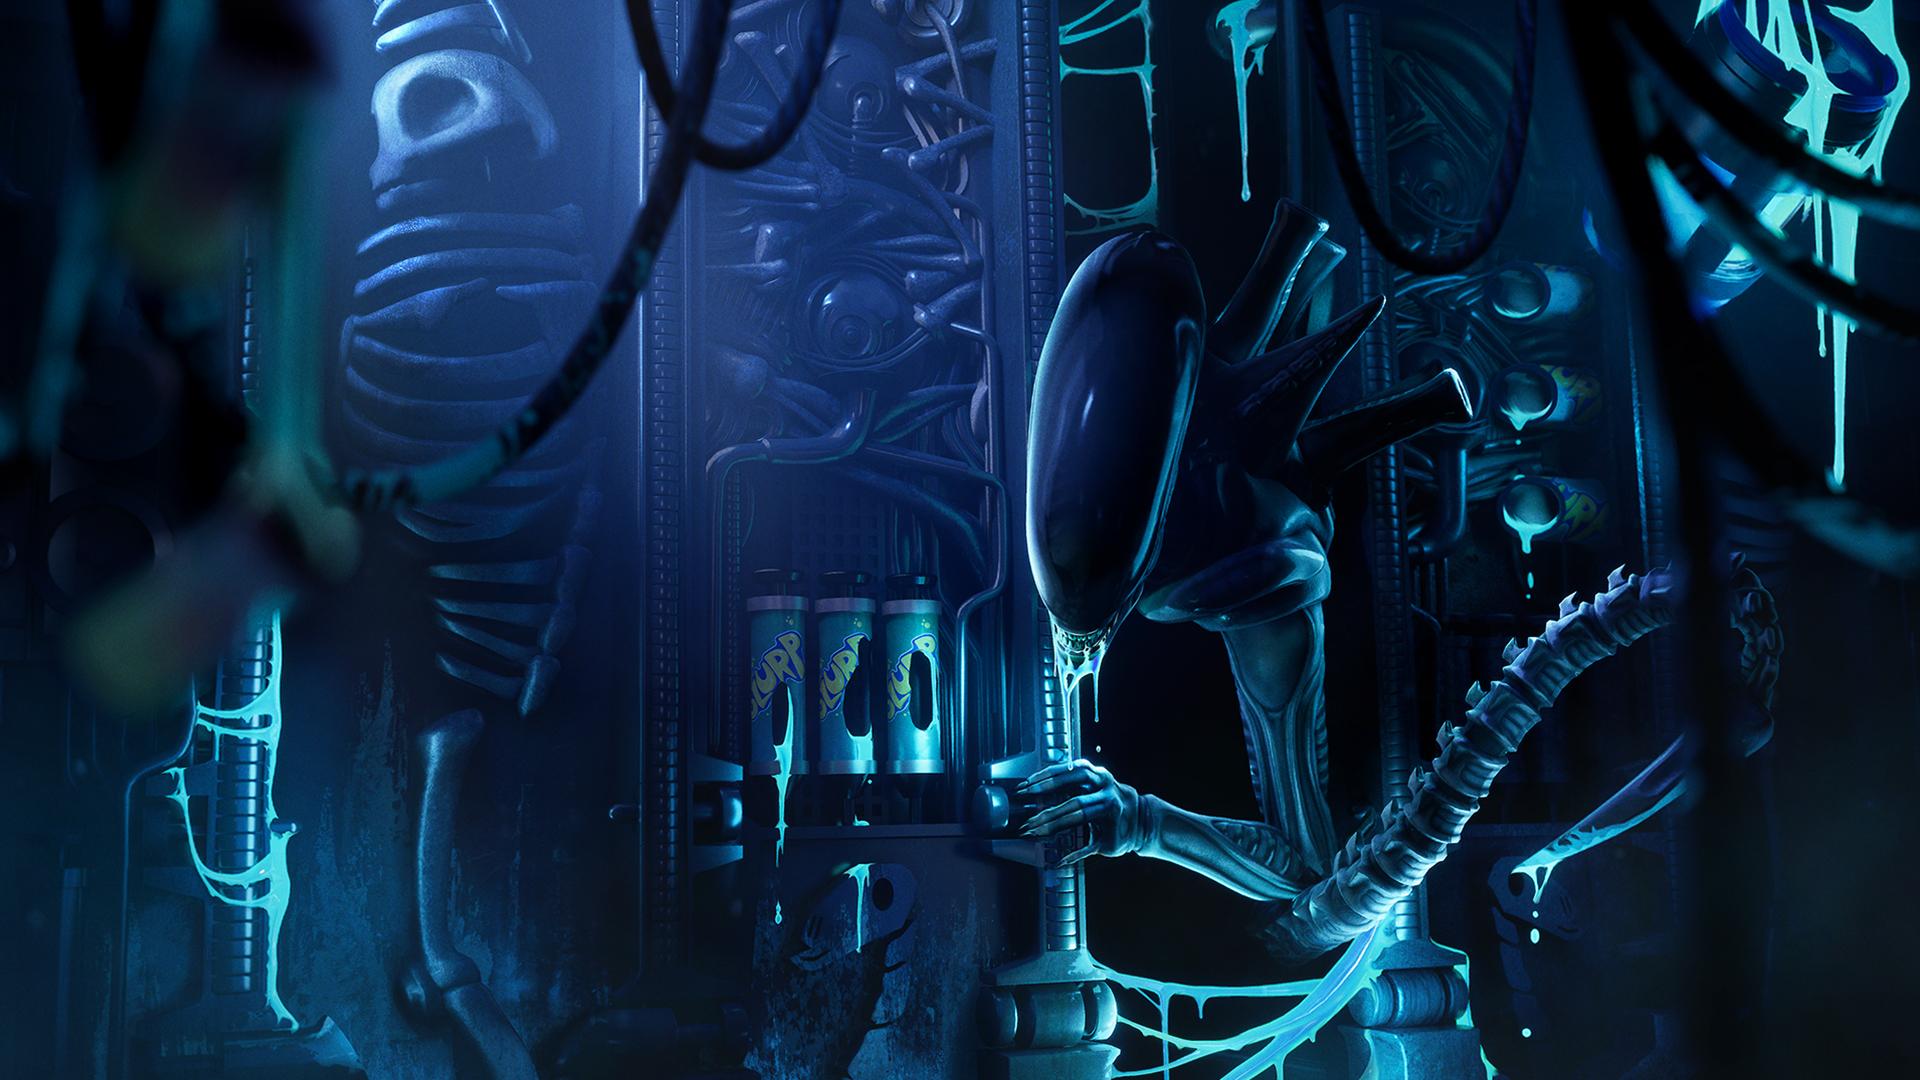 Ripley and Xenomorph icon